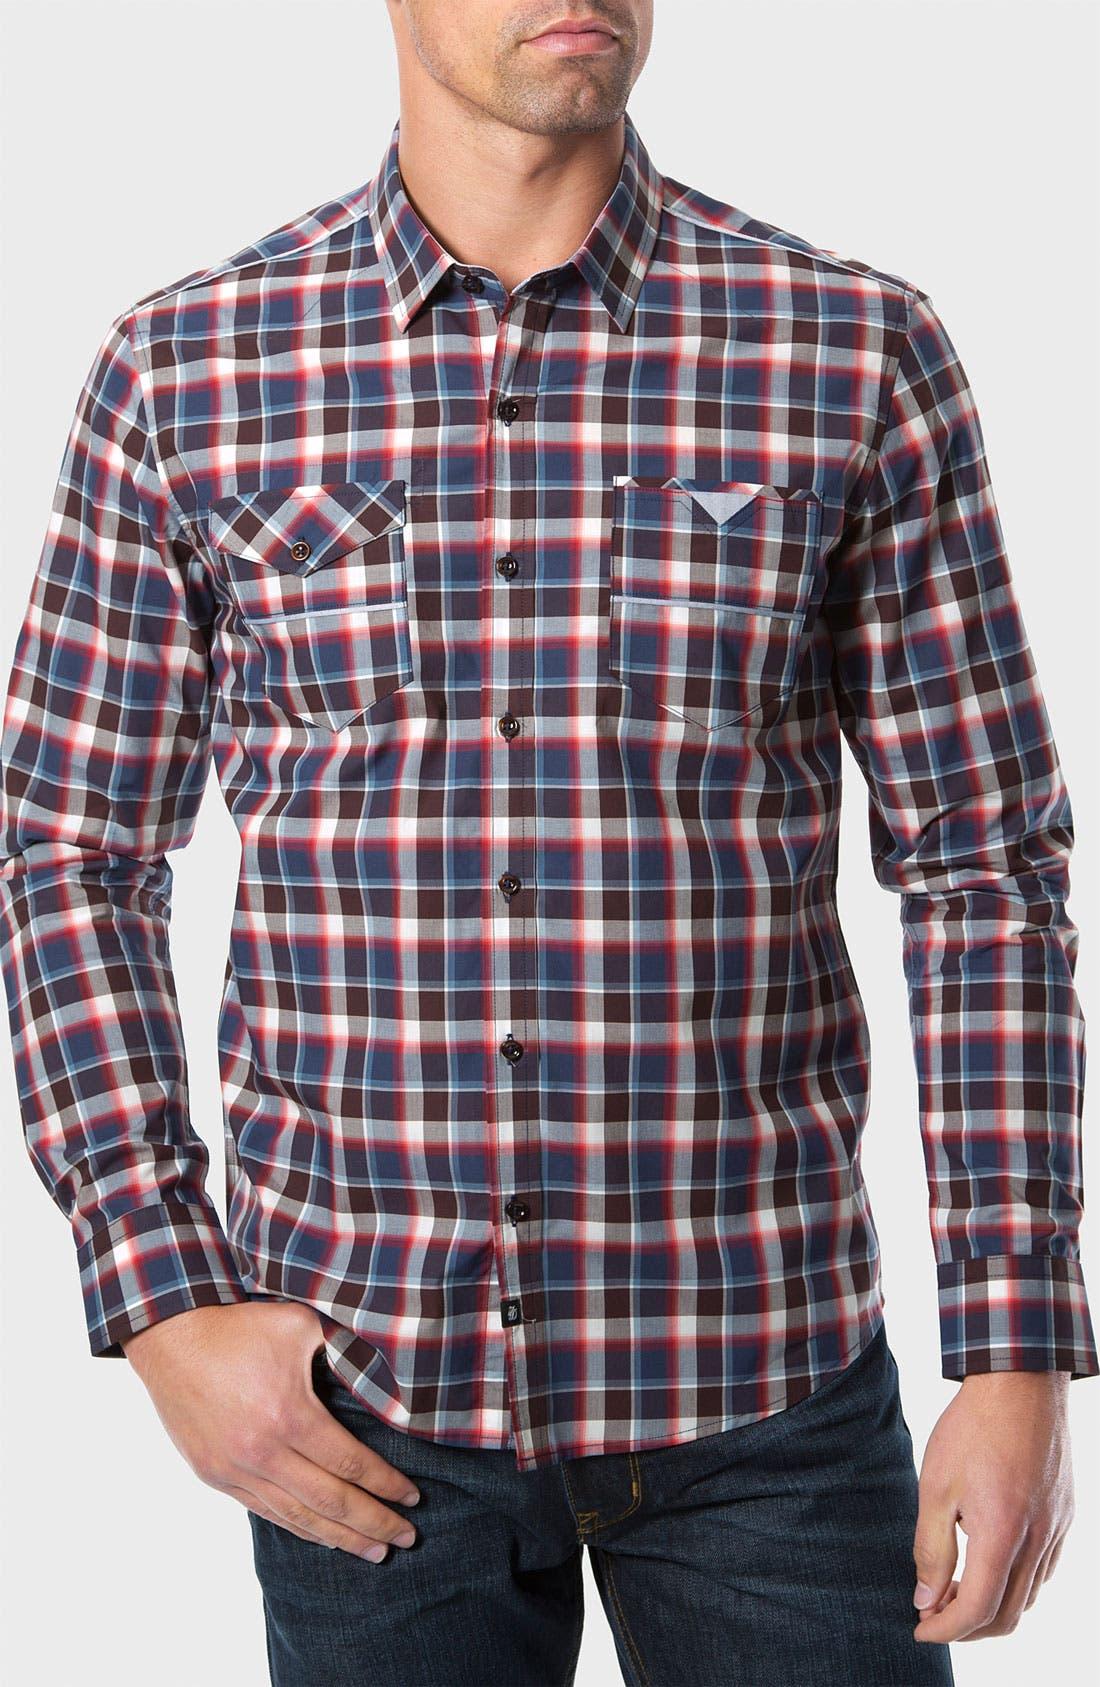 Alternate Image 1 Selected - 7 Diamonds 'The Ride' Check Trim Fit Cotton Sport Shirt